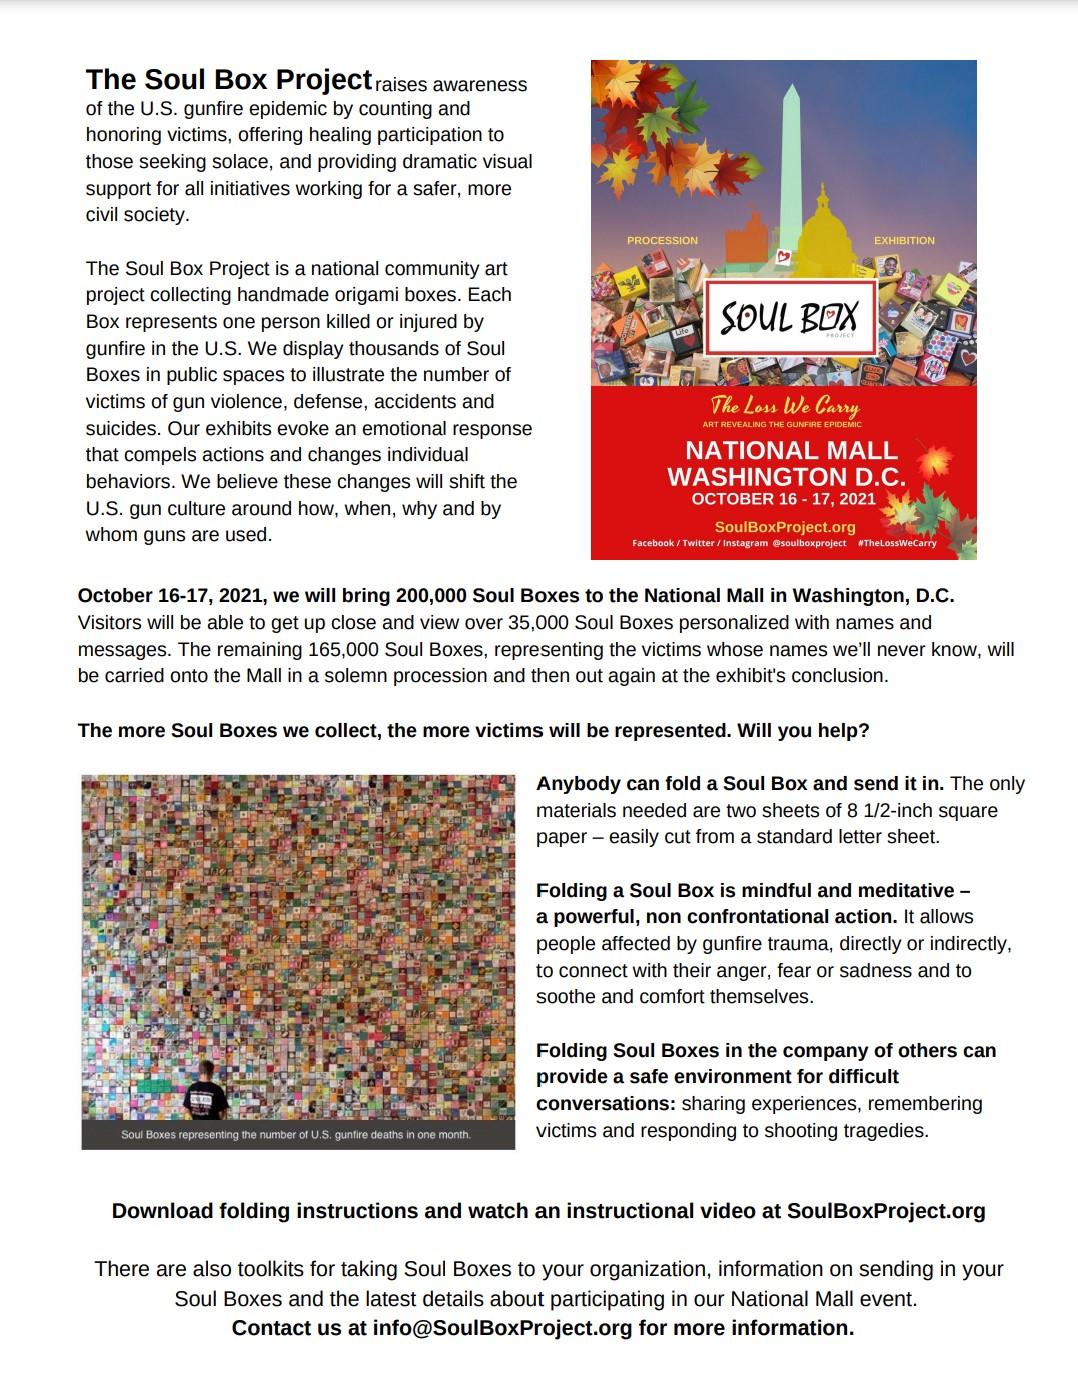 Media Press Release for Washington DC National Mall Exhibit